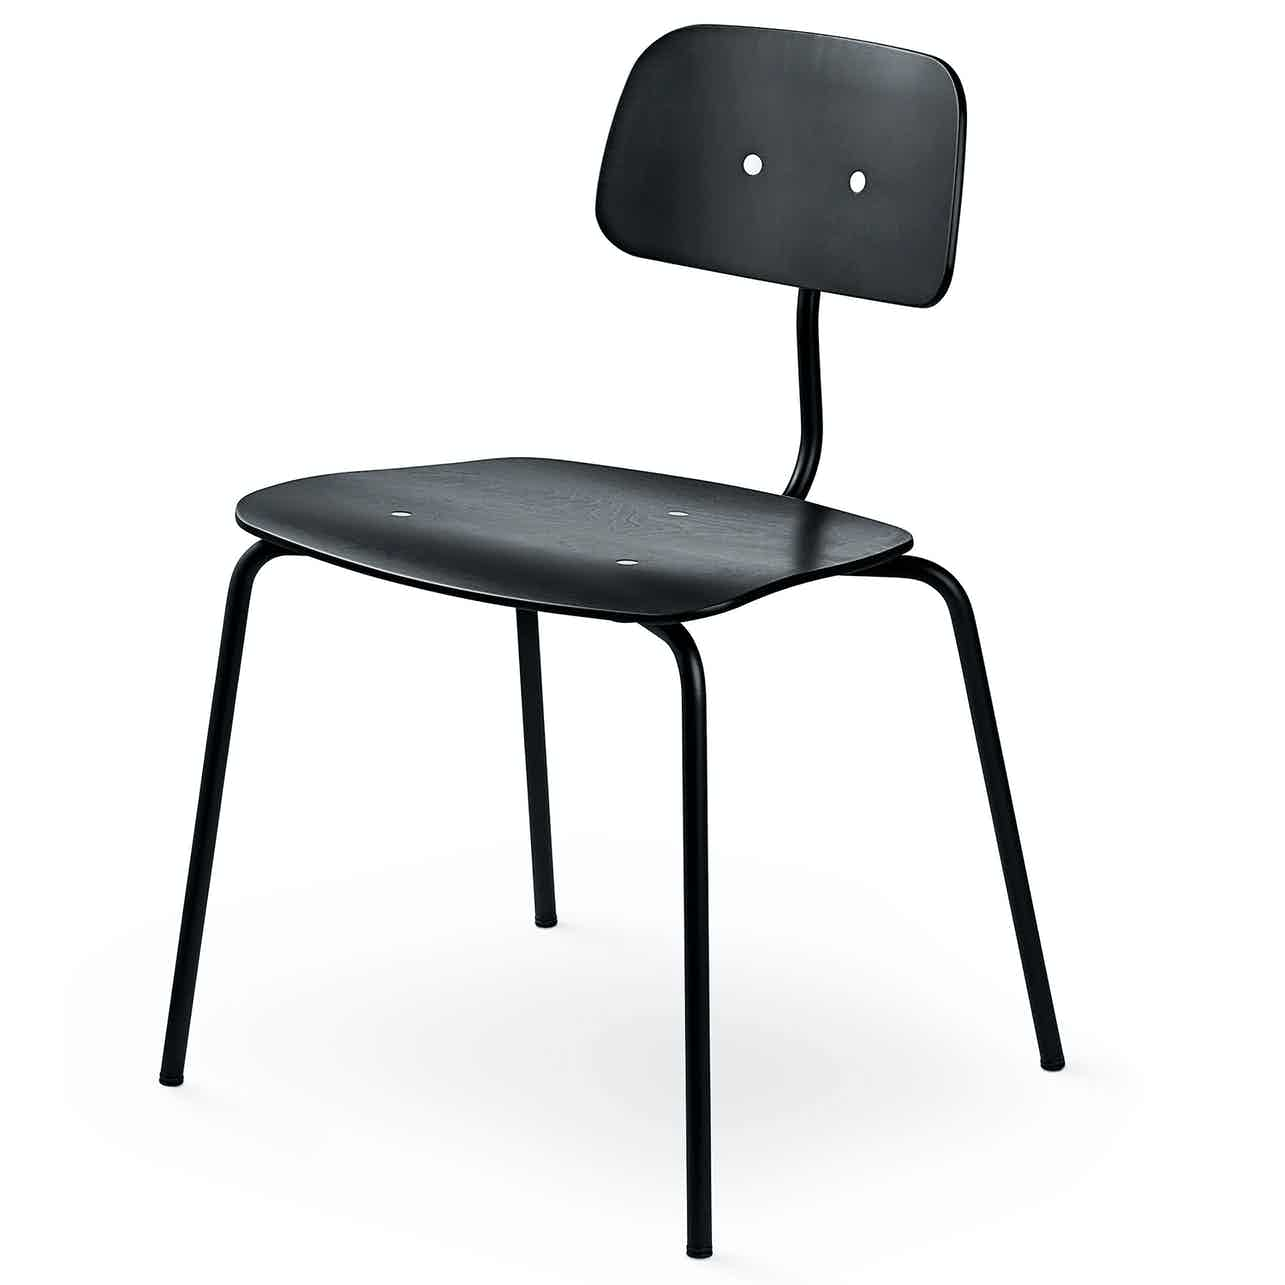 Engelbrechts kevi 2060 chair veneer angle haute living